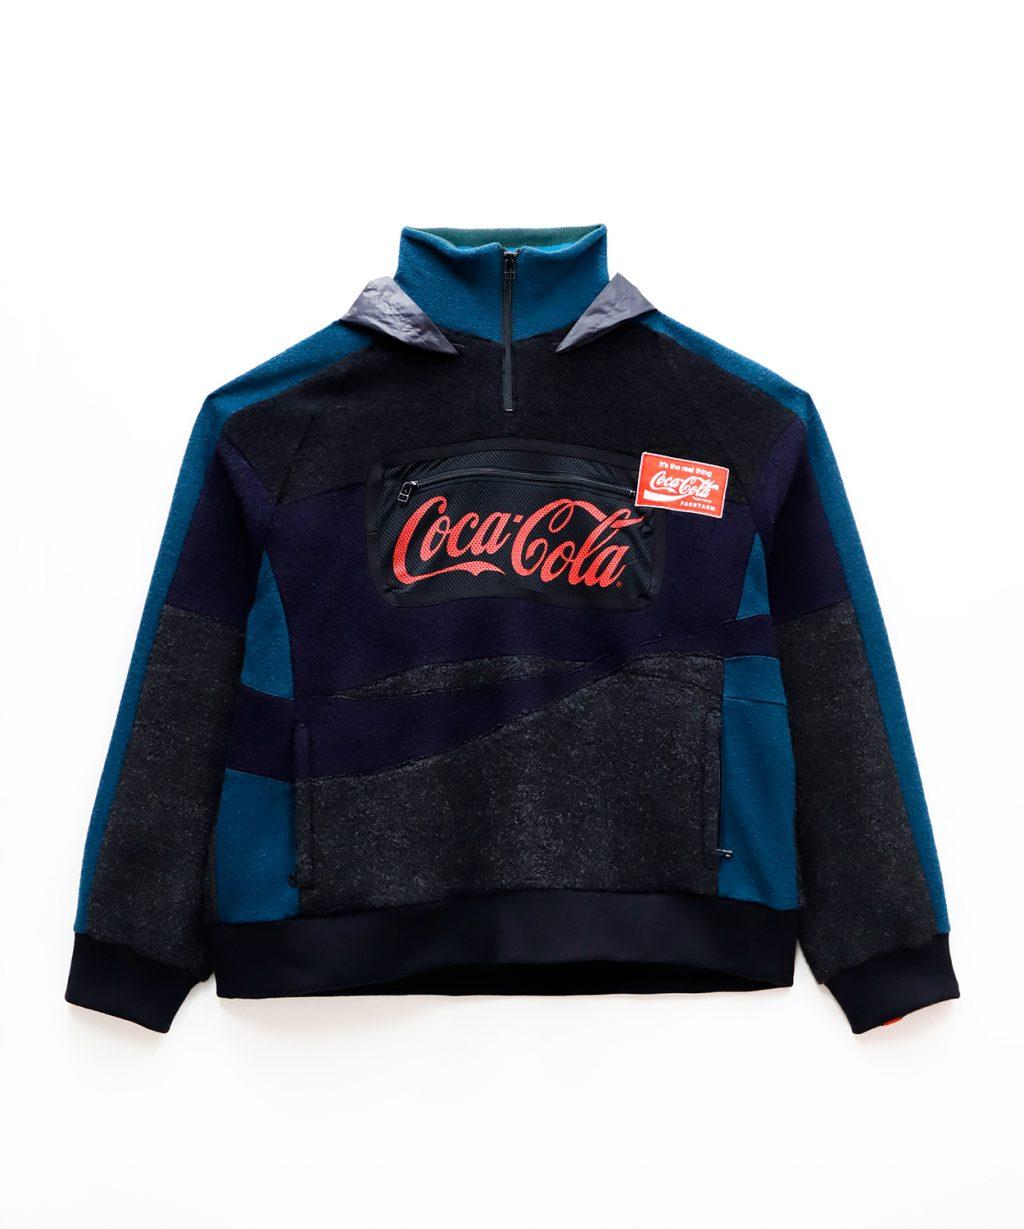 COCA-COLA-MIX-BIG-HOODIE-black1-1024x1229.jpg